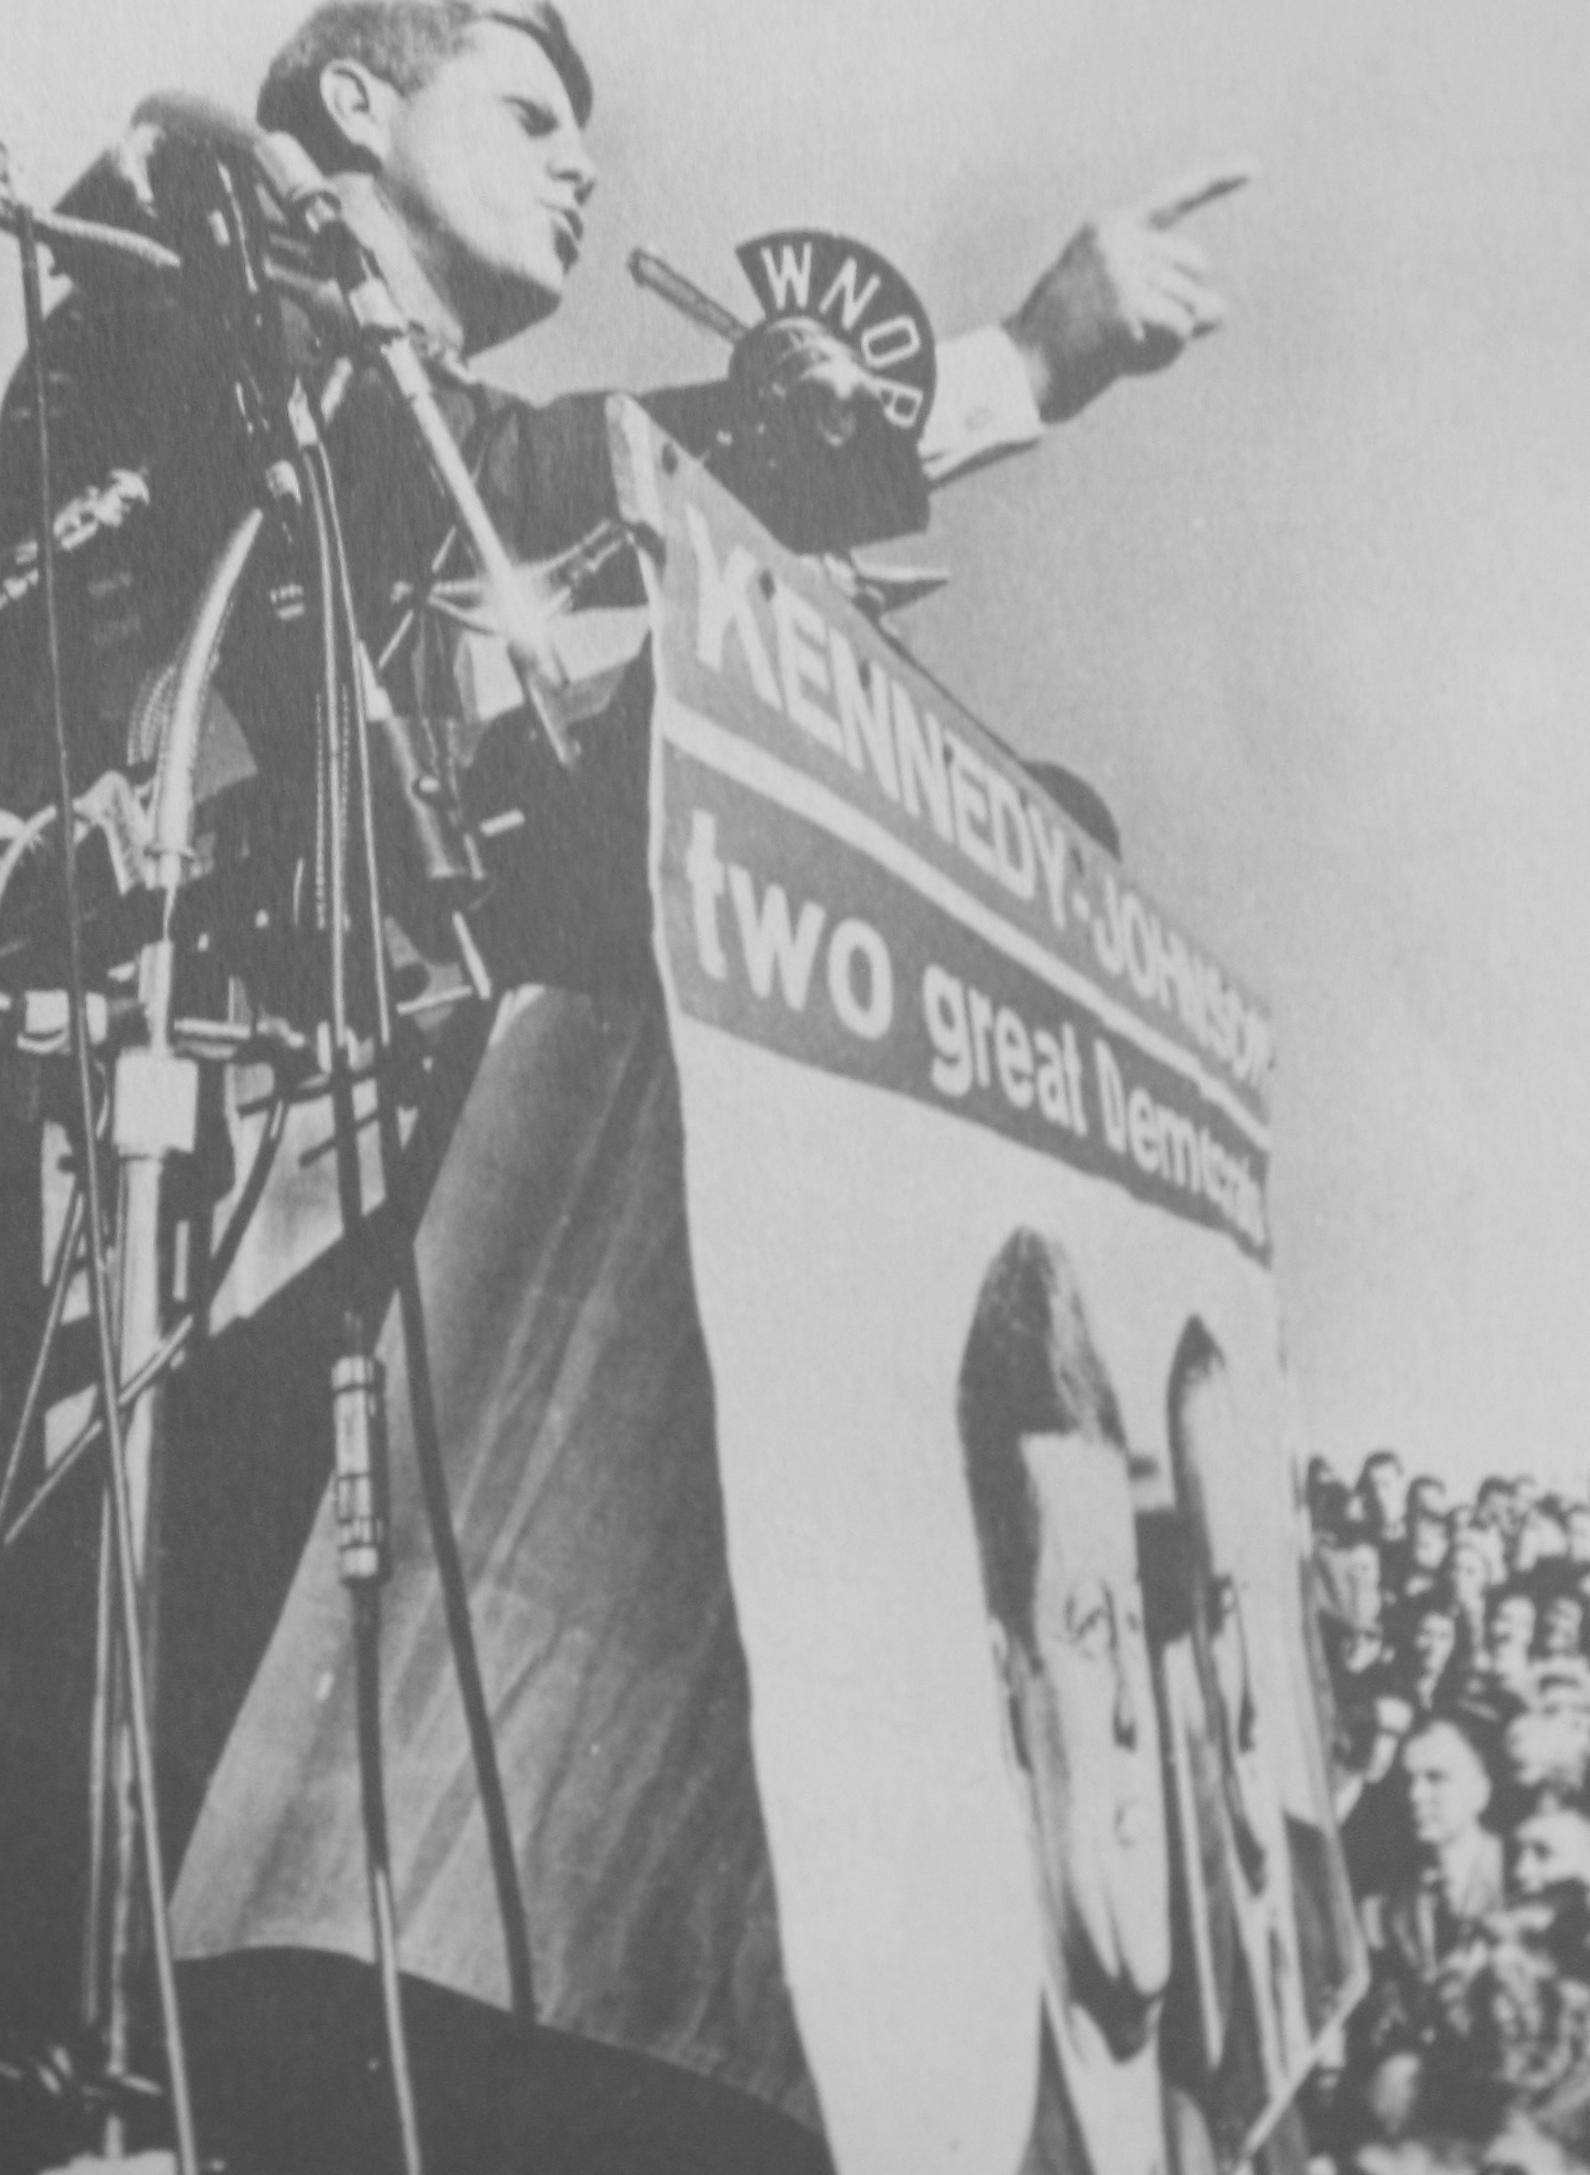 Kennedy and WNOR